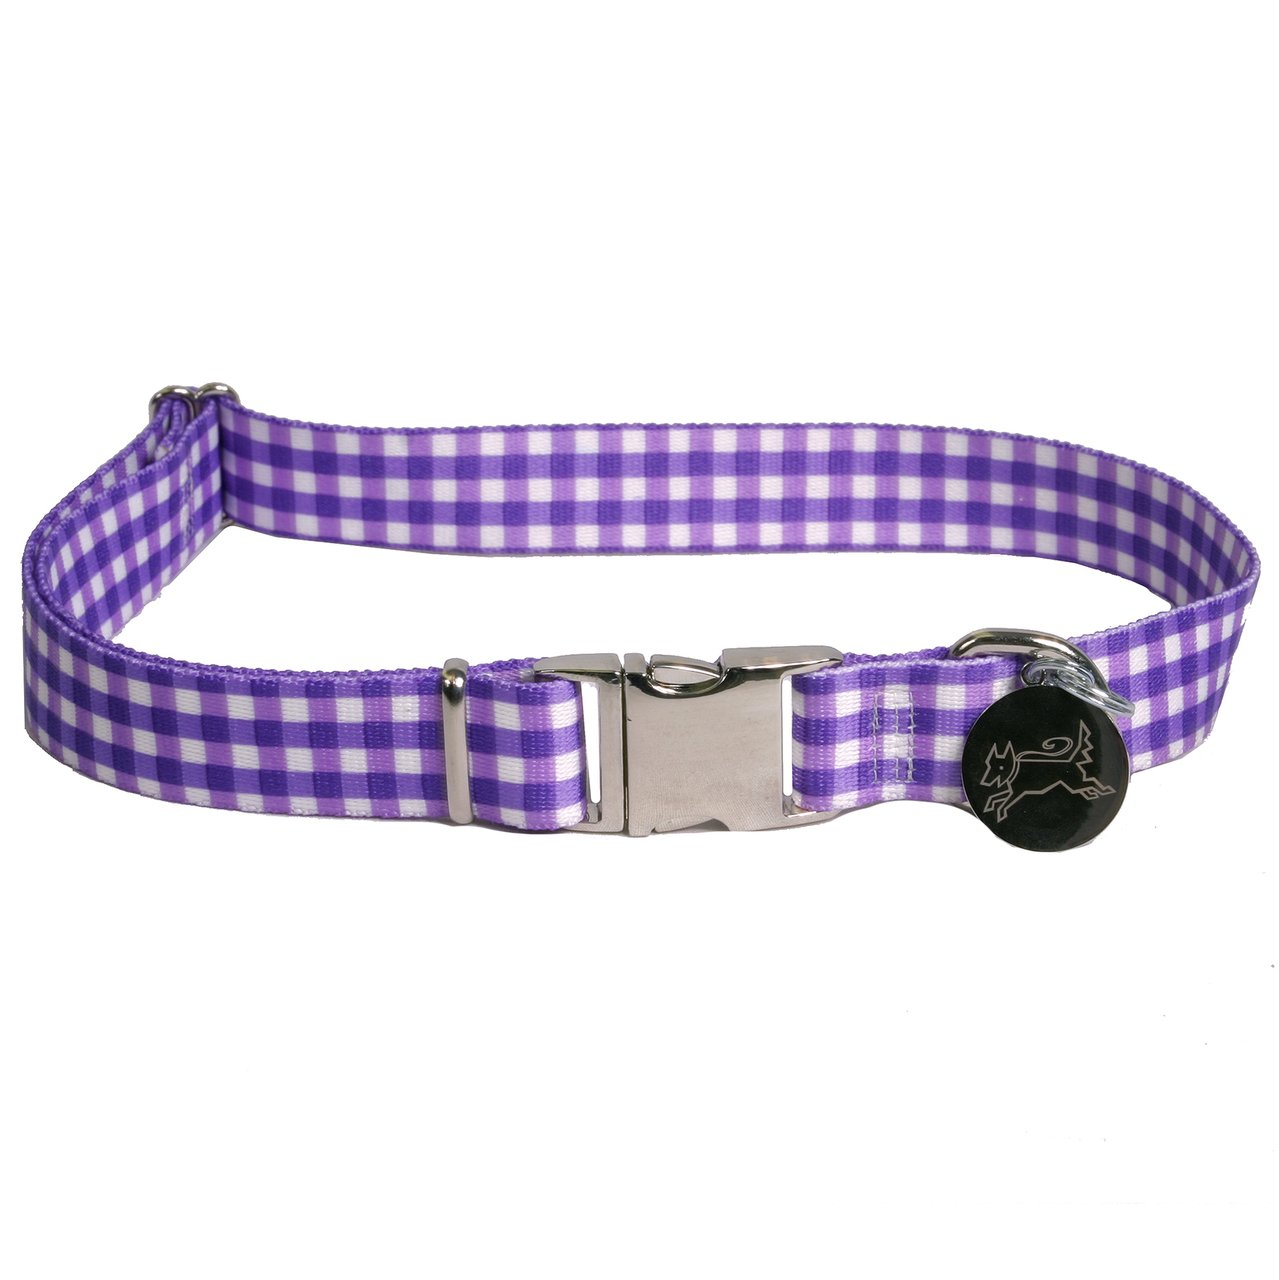 Southern Dawg Gingham Purple Premium Dog Collar - Size Medium 14'' - 20'' by Yellow Dog Design